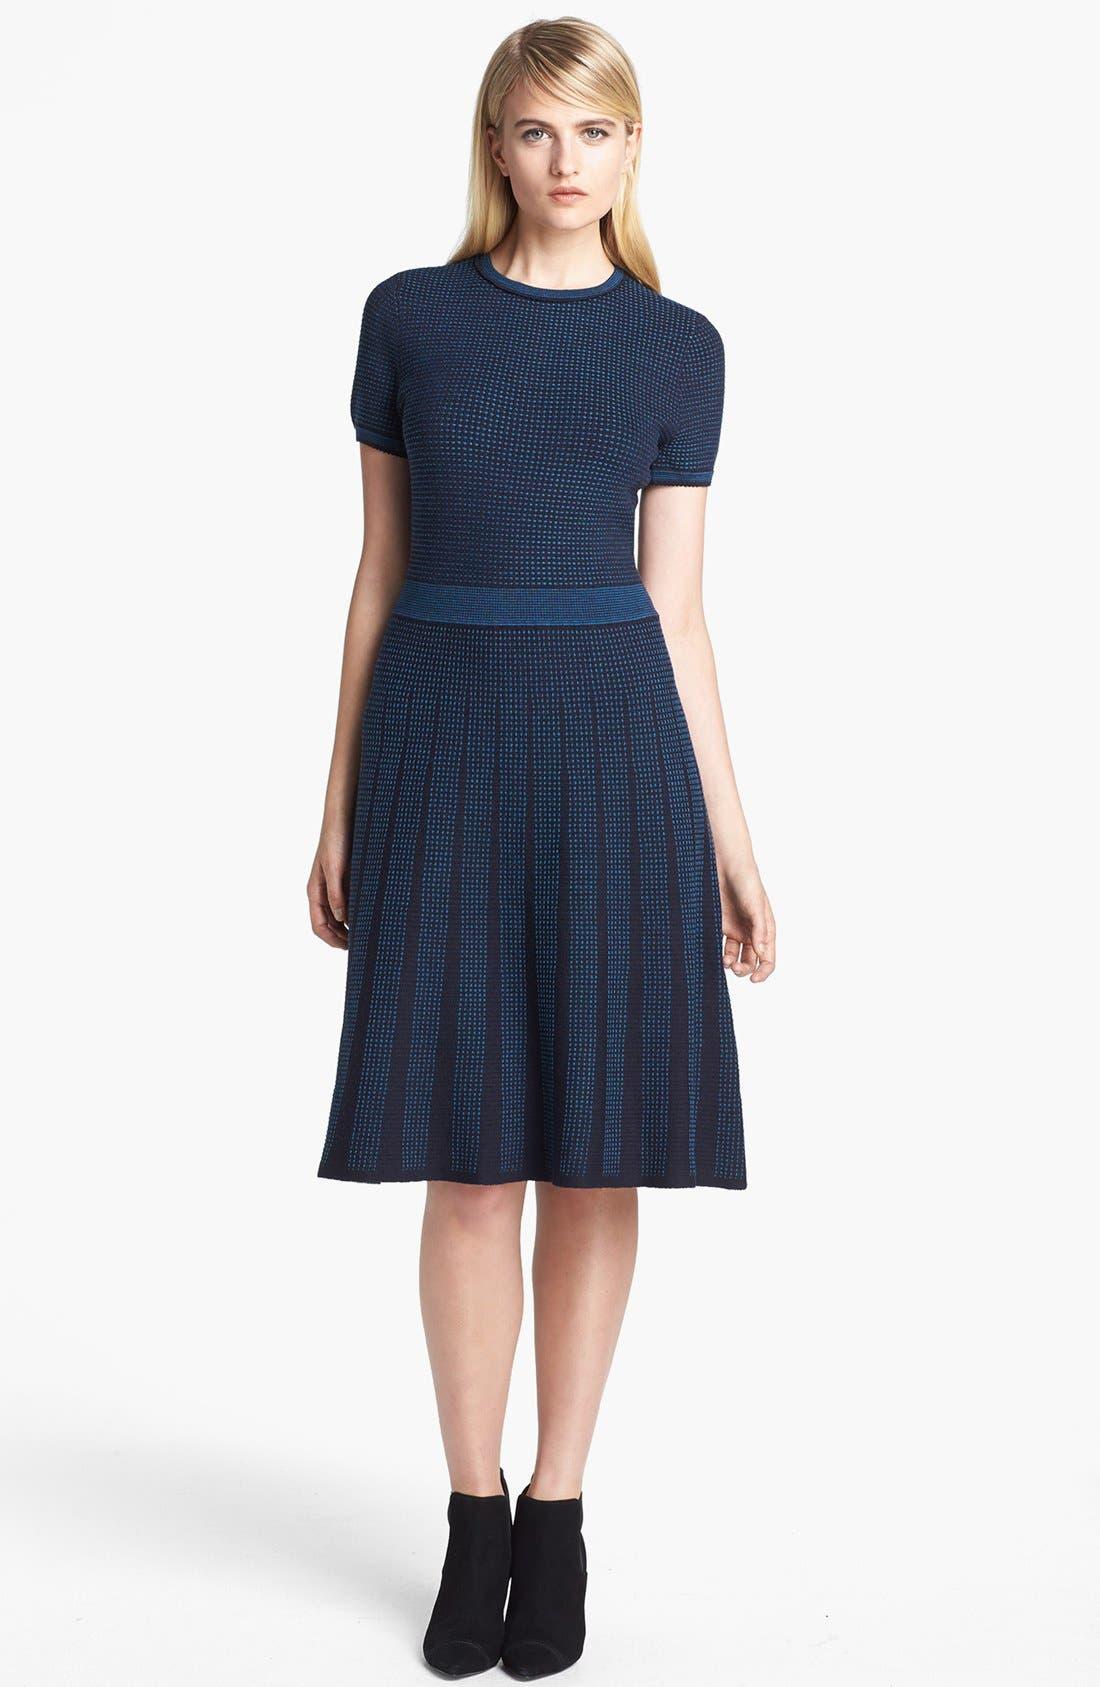 Main Image - Tory Burch 'Sadie' Wool Blend A-Line Dress